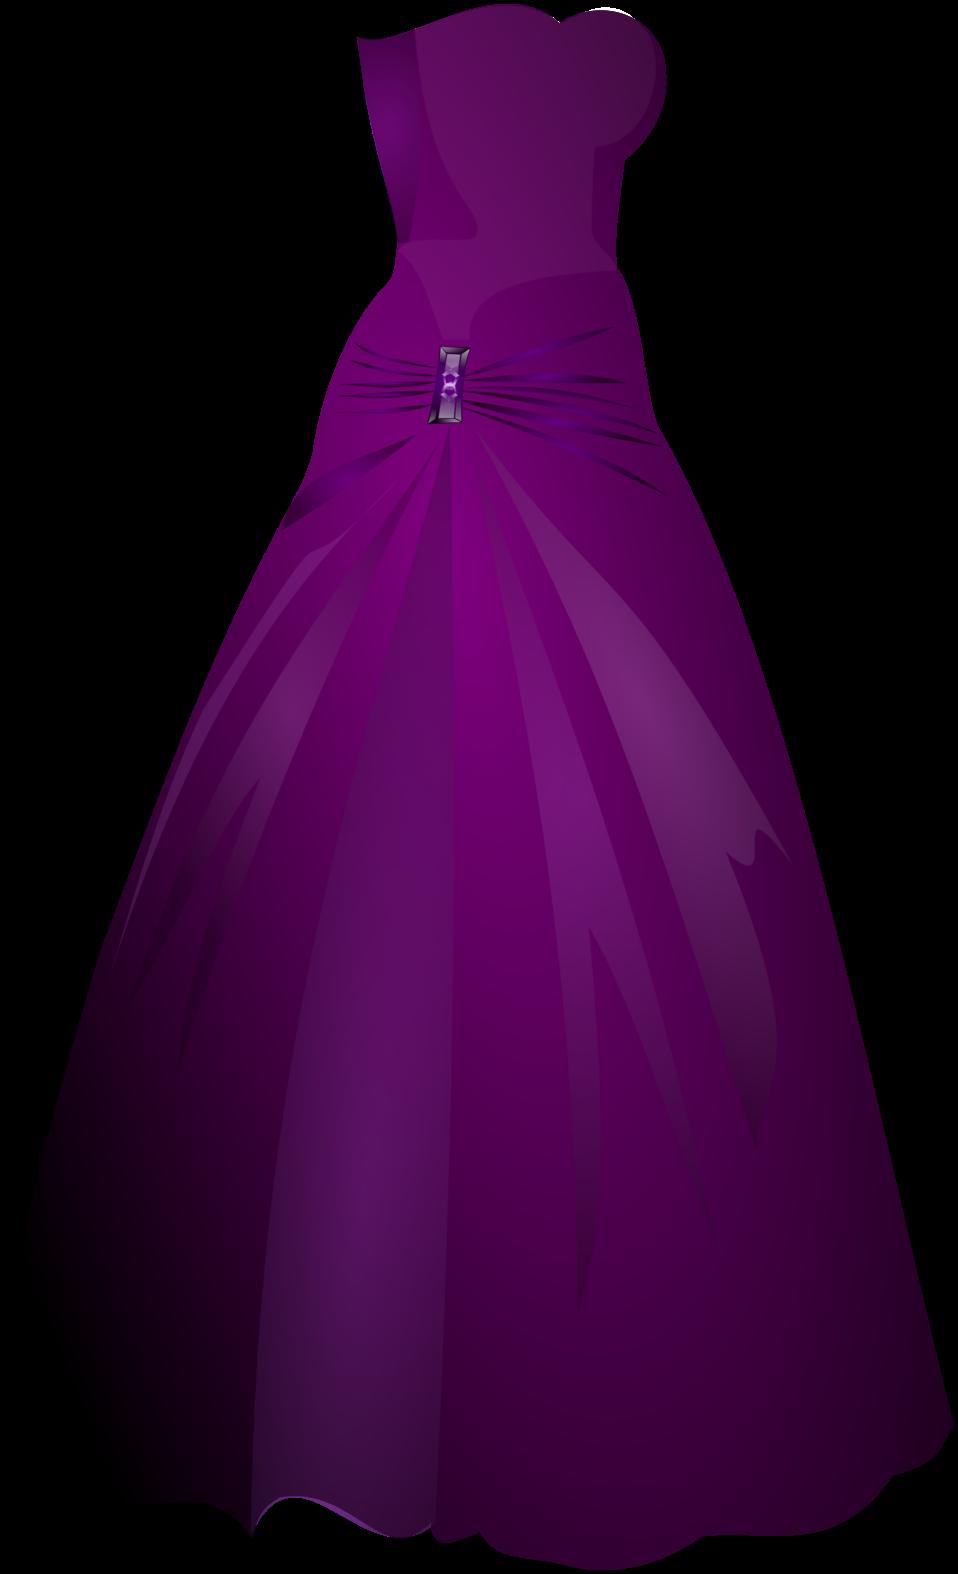 Violet Dress Clipart